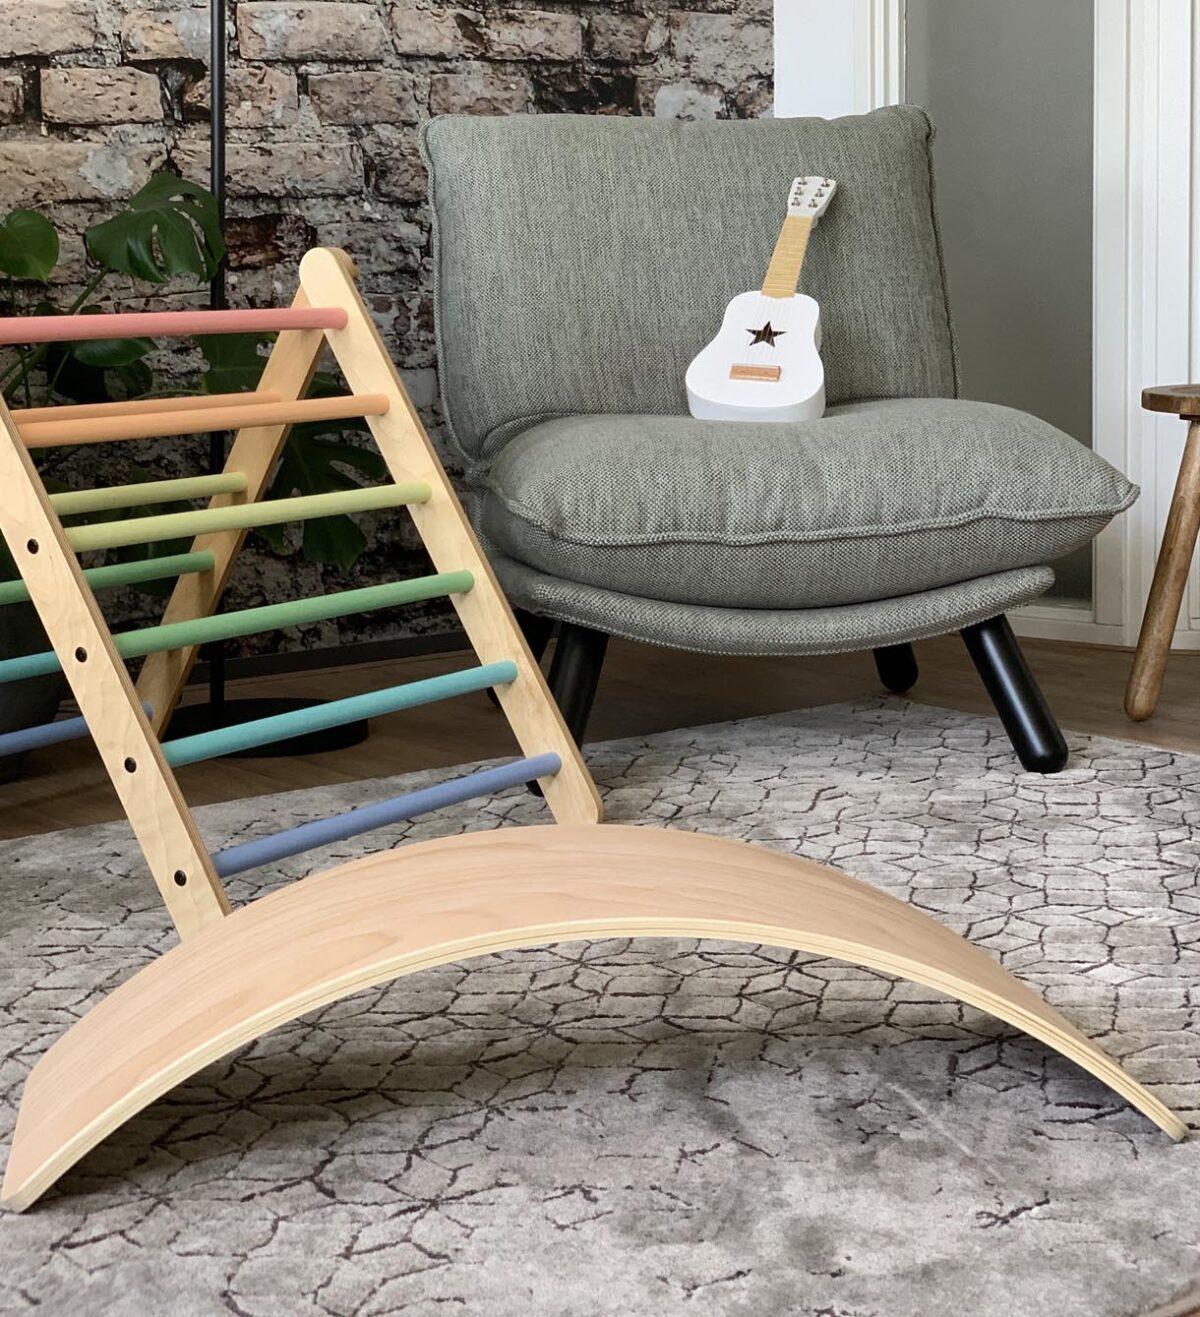 Houten-balance-board-jindl